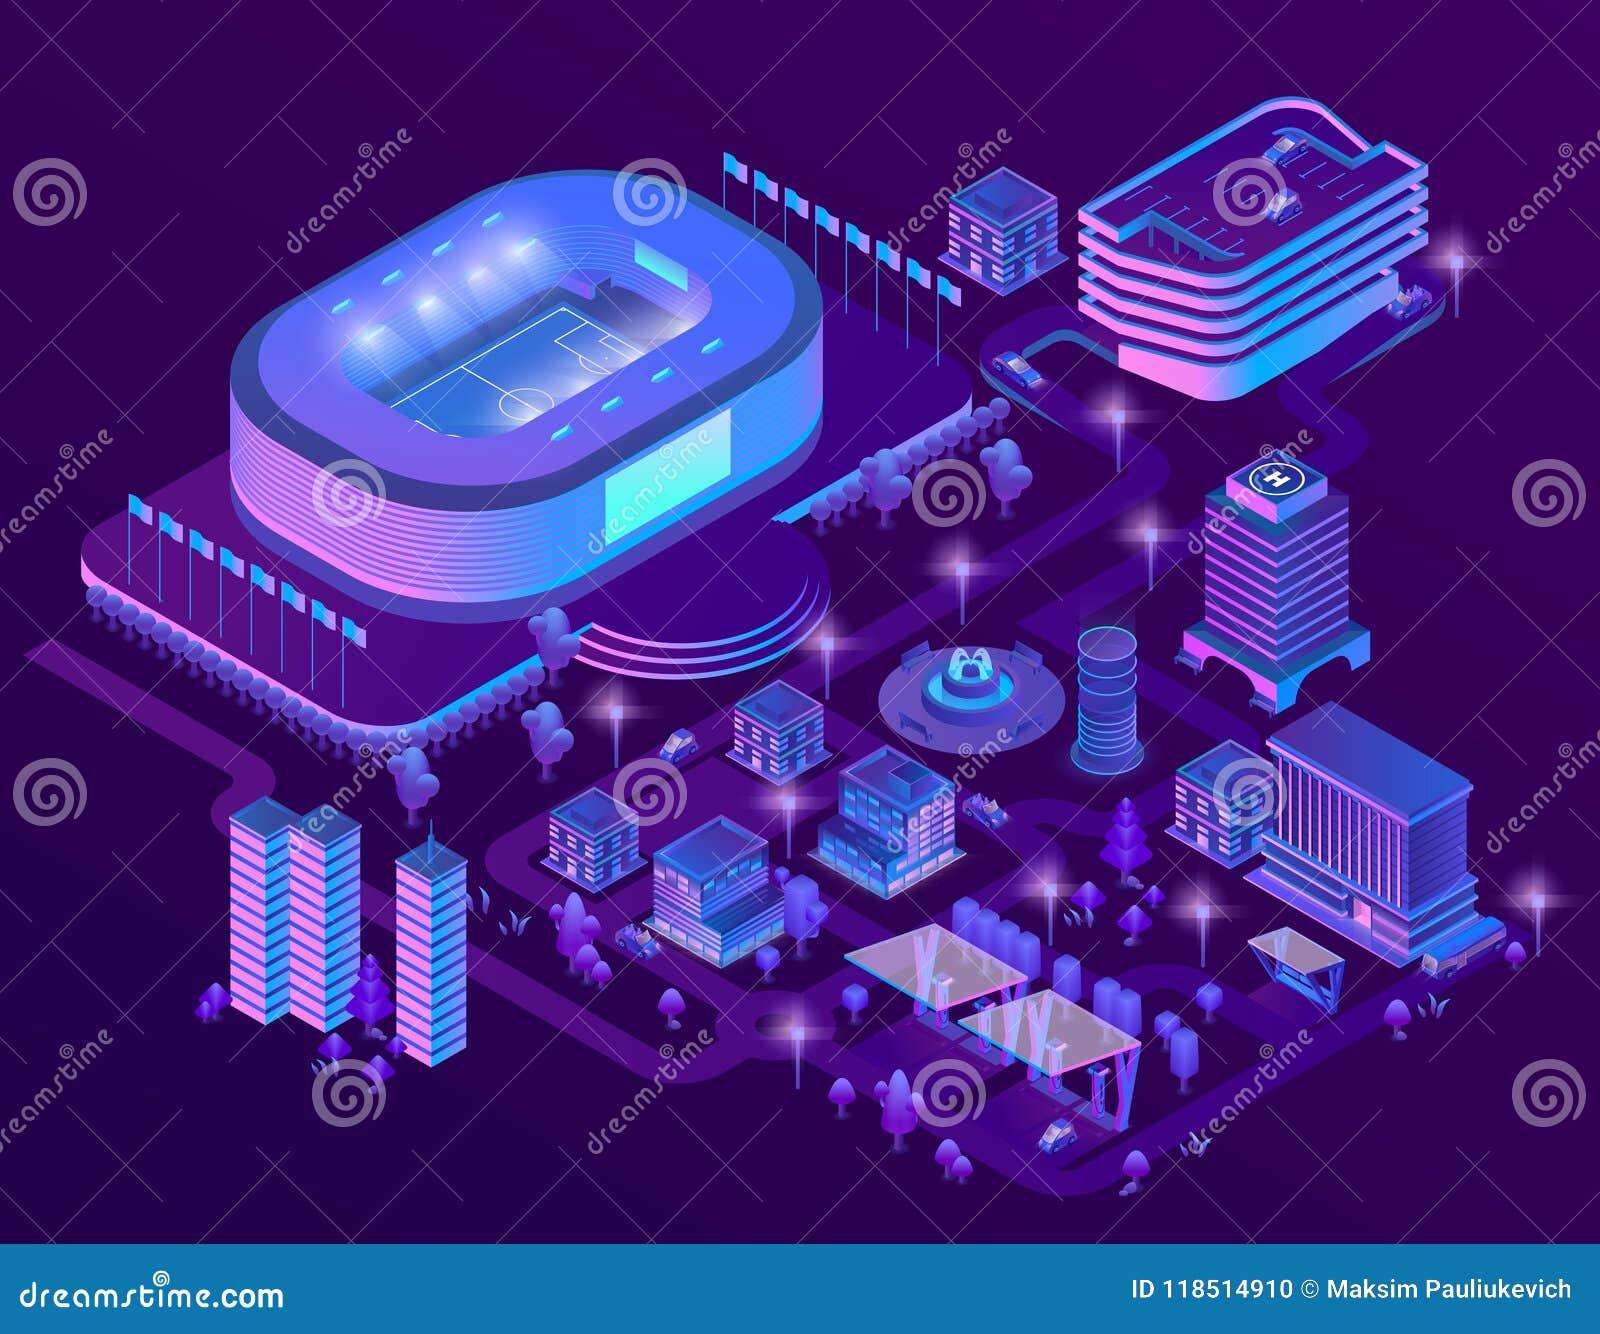 Vector 3d isometric ultraviolet megapolis with stadium